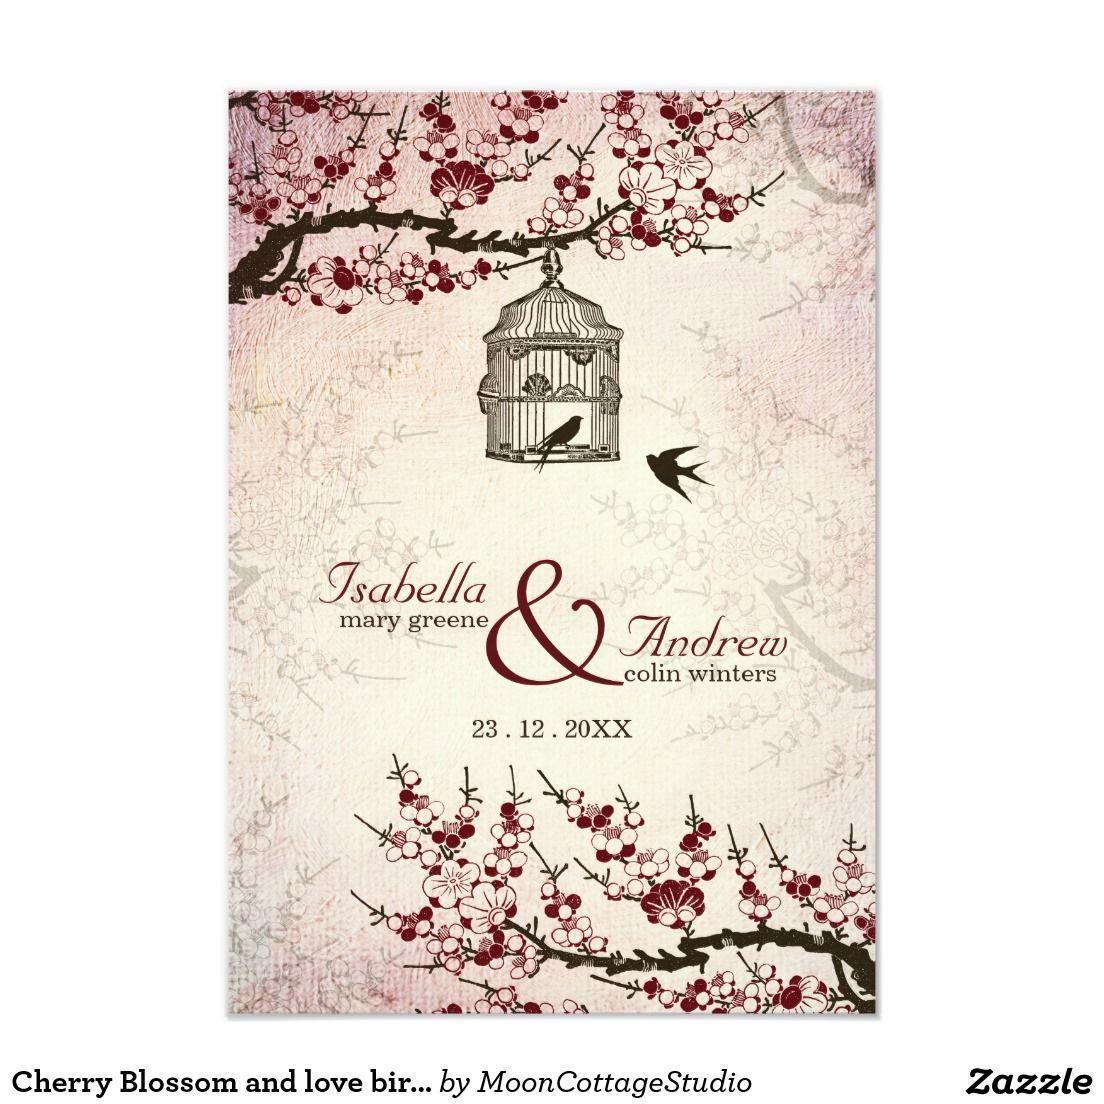 Cherry Blossom and love birds wedding invite | Vintage wedding ...